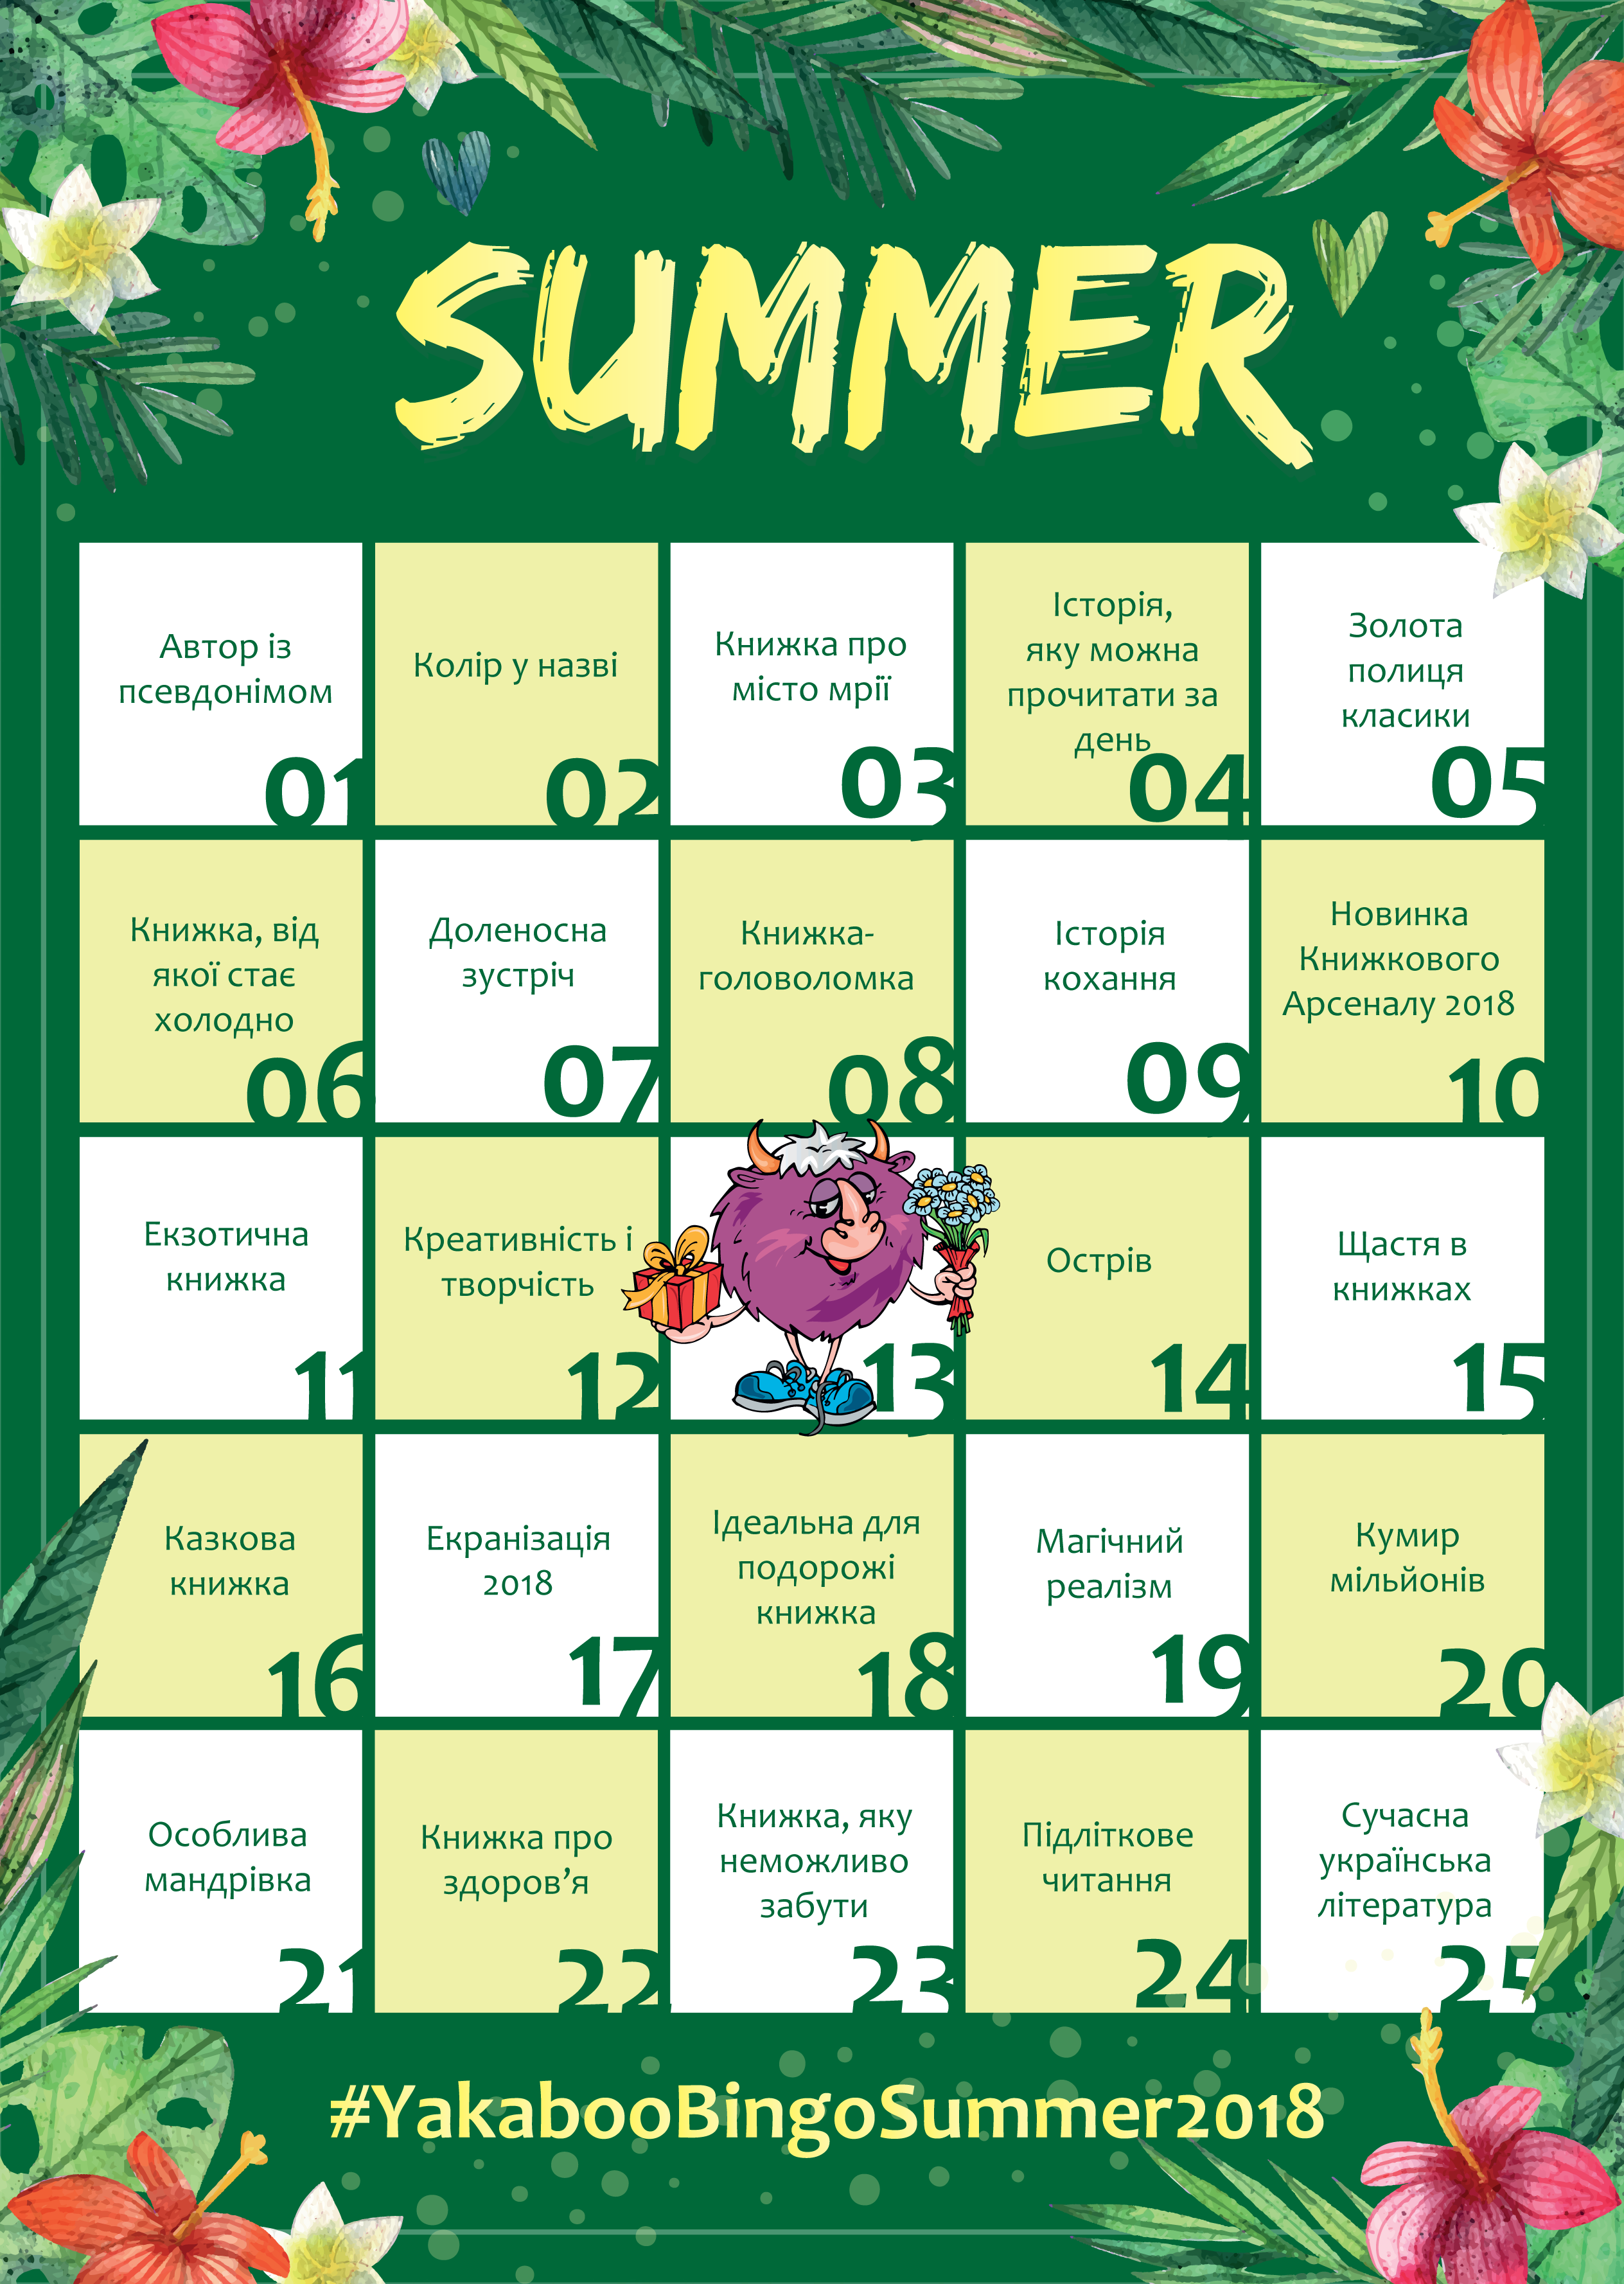 Bingo_summer